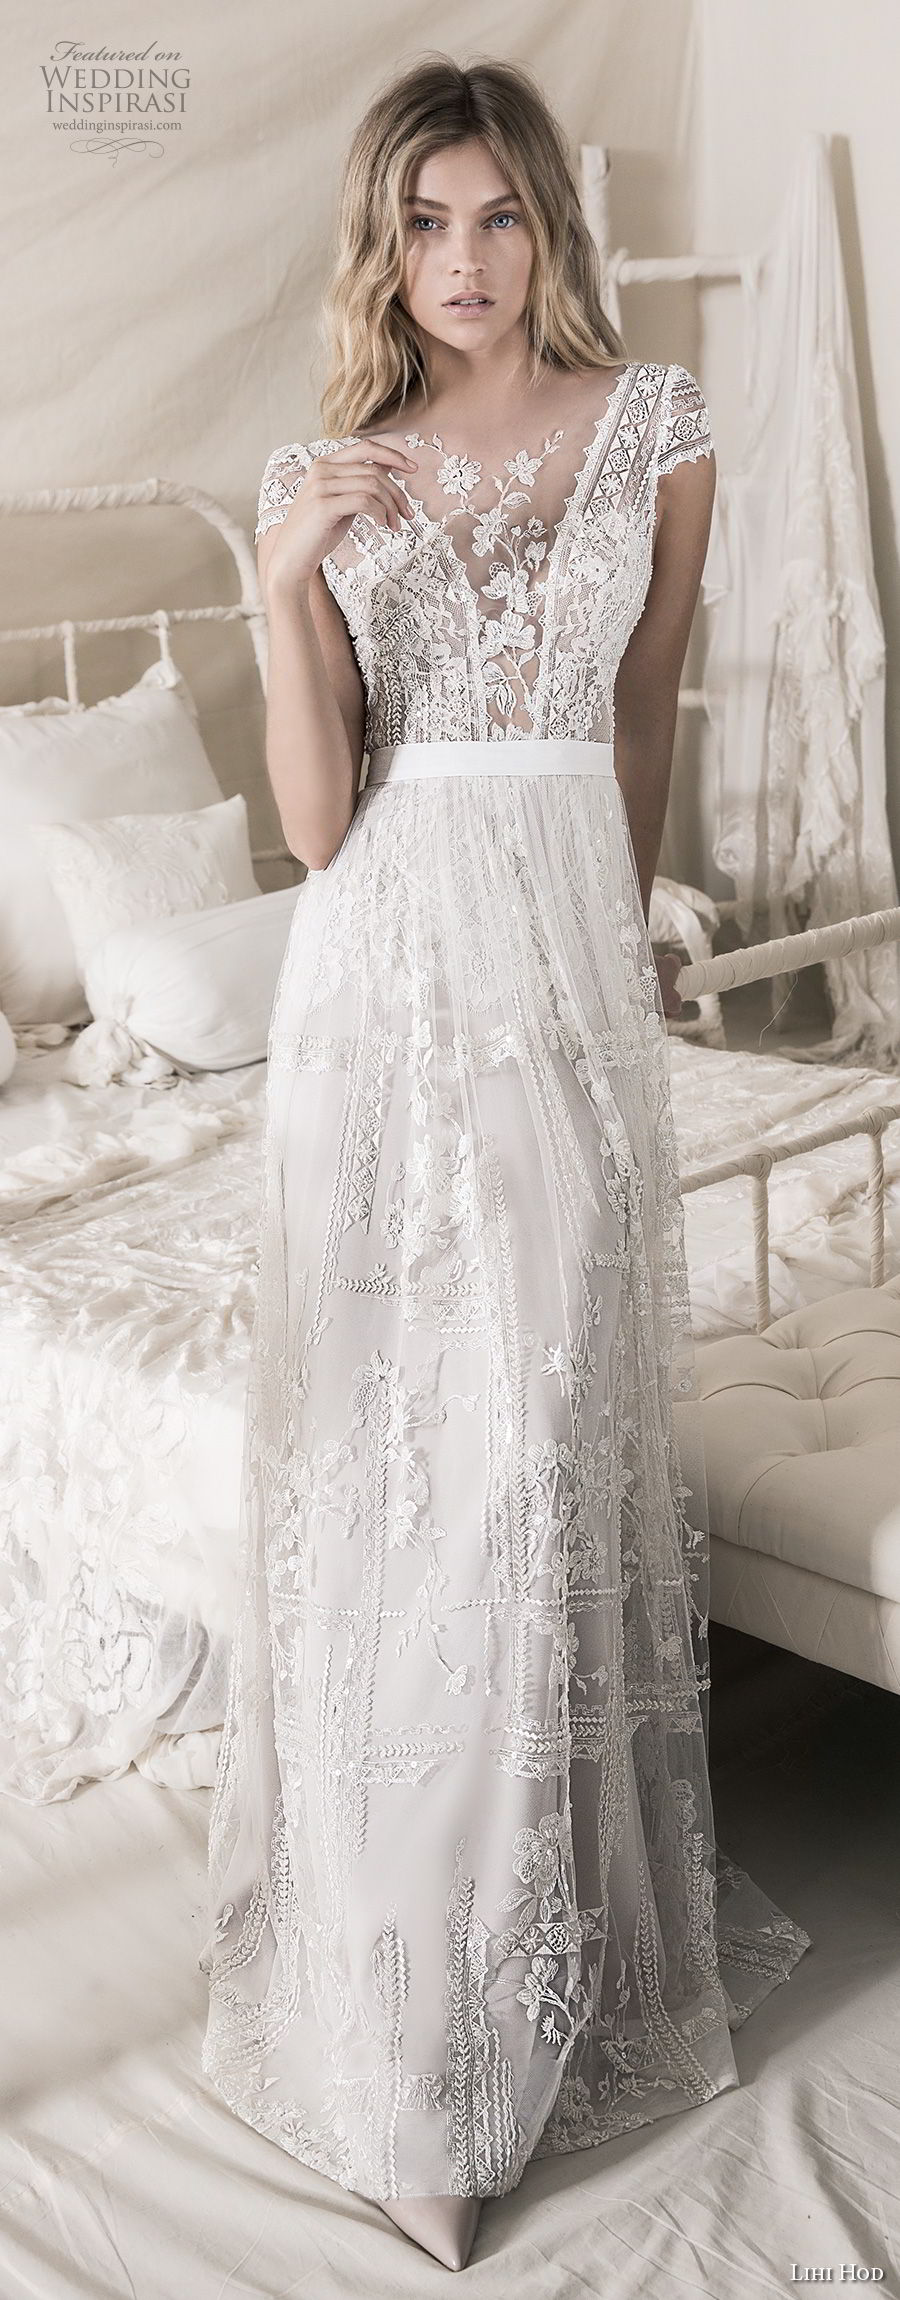 lihi hod 2018 bridal cap sleeves illusion jewel deep v neck heavily embellised bodice romantic bohemian soft a  line wedding dress open strap back sweep train (5) mv fv